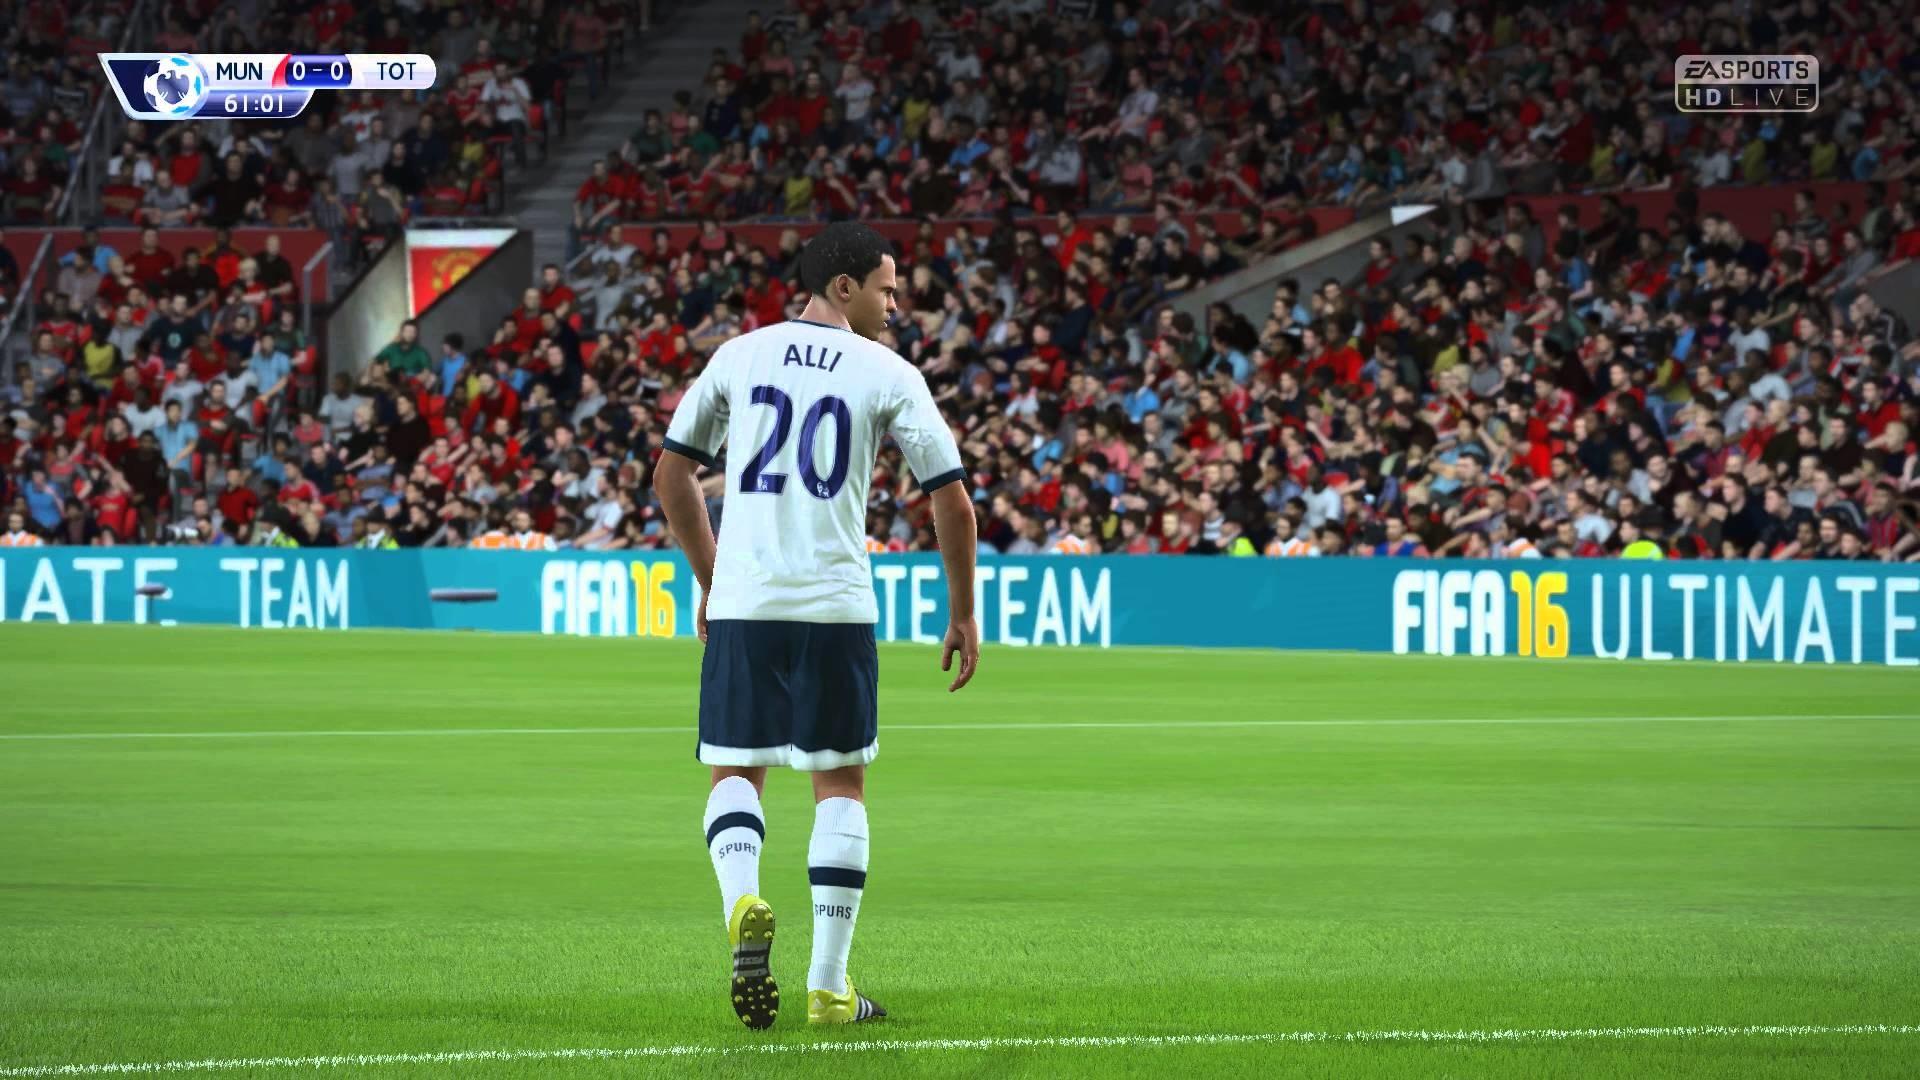 FIFA 16 – Manchester United vs. Tottenham Hotspur Premier League